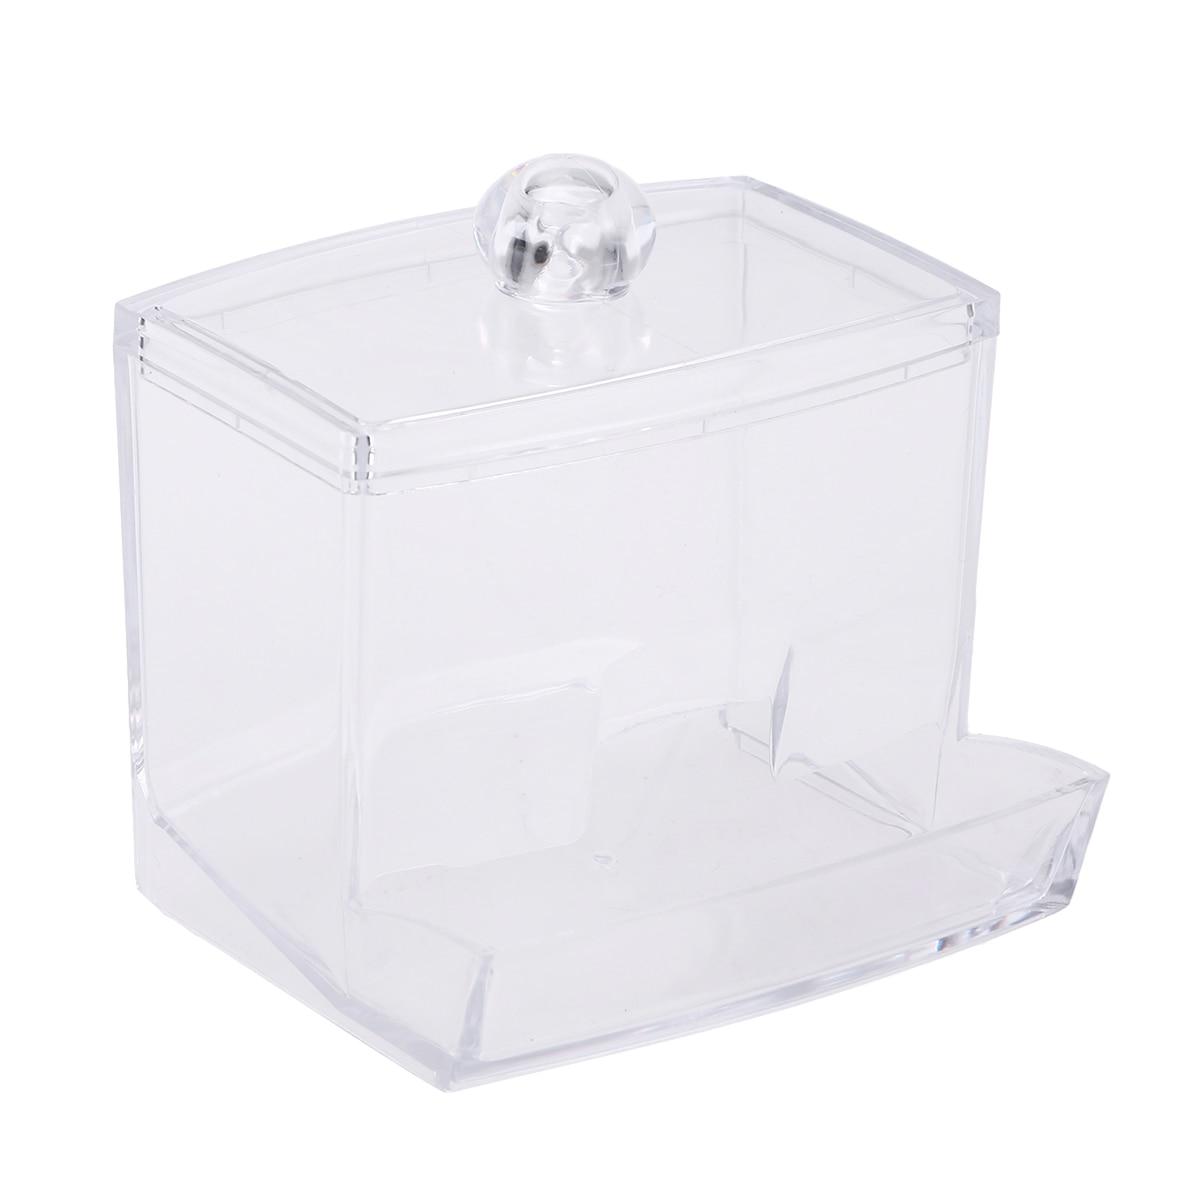 Bastoncillo de algodón a prueba de polvo organizador caja de almacenamiento exótico Mesa Caja de almacenamiento para palillos de dientes dispensador de mondadientes A30